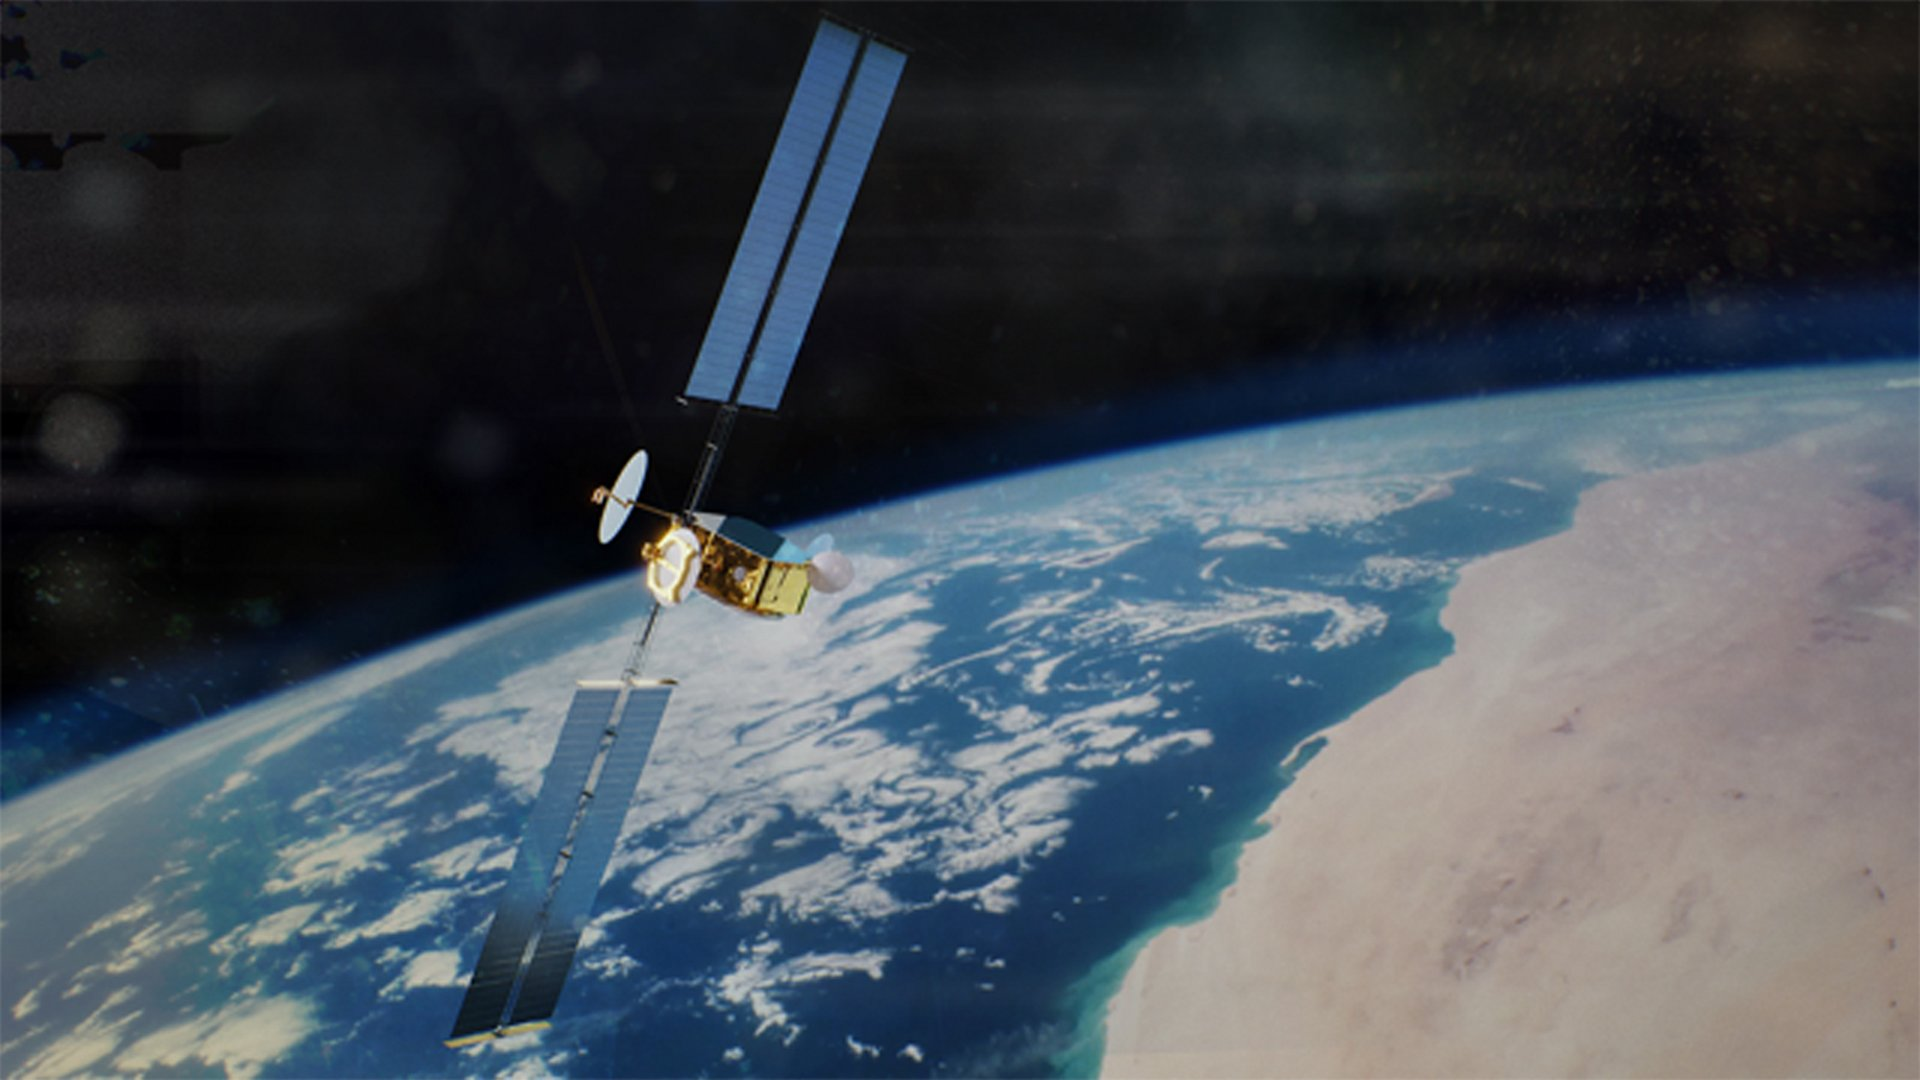 Artist View OneSat Satellite Deployed In Space